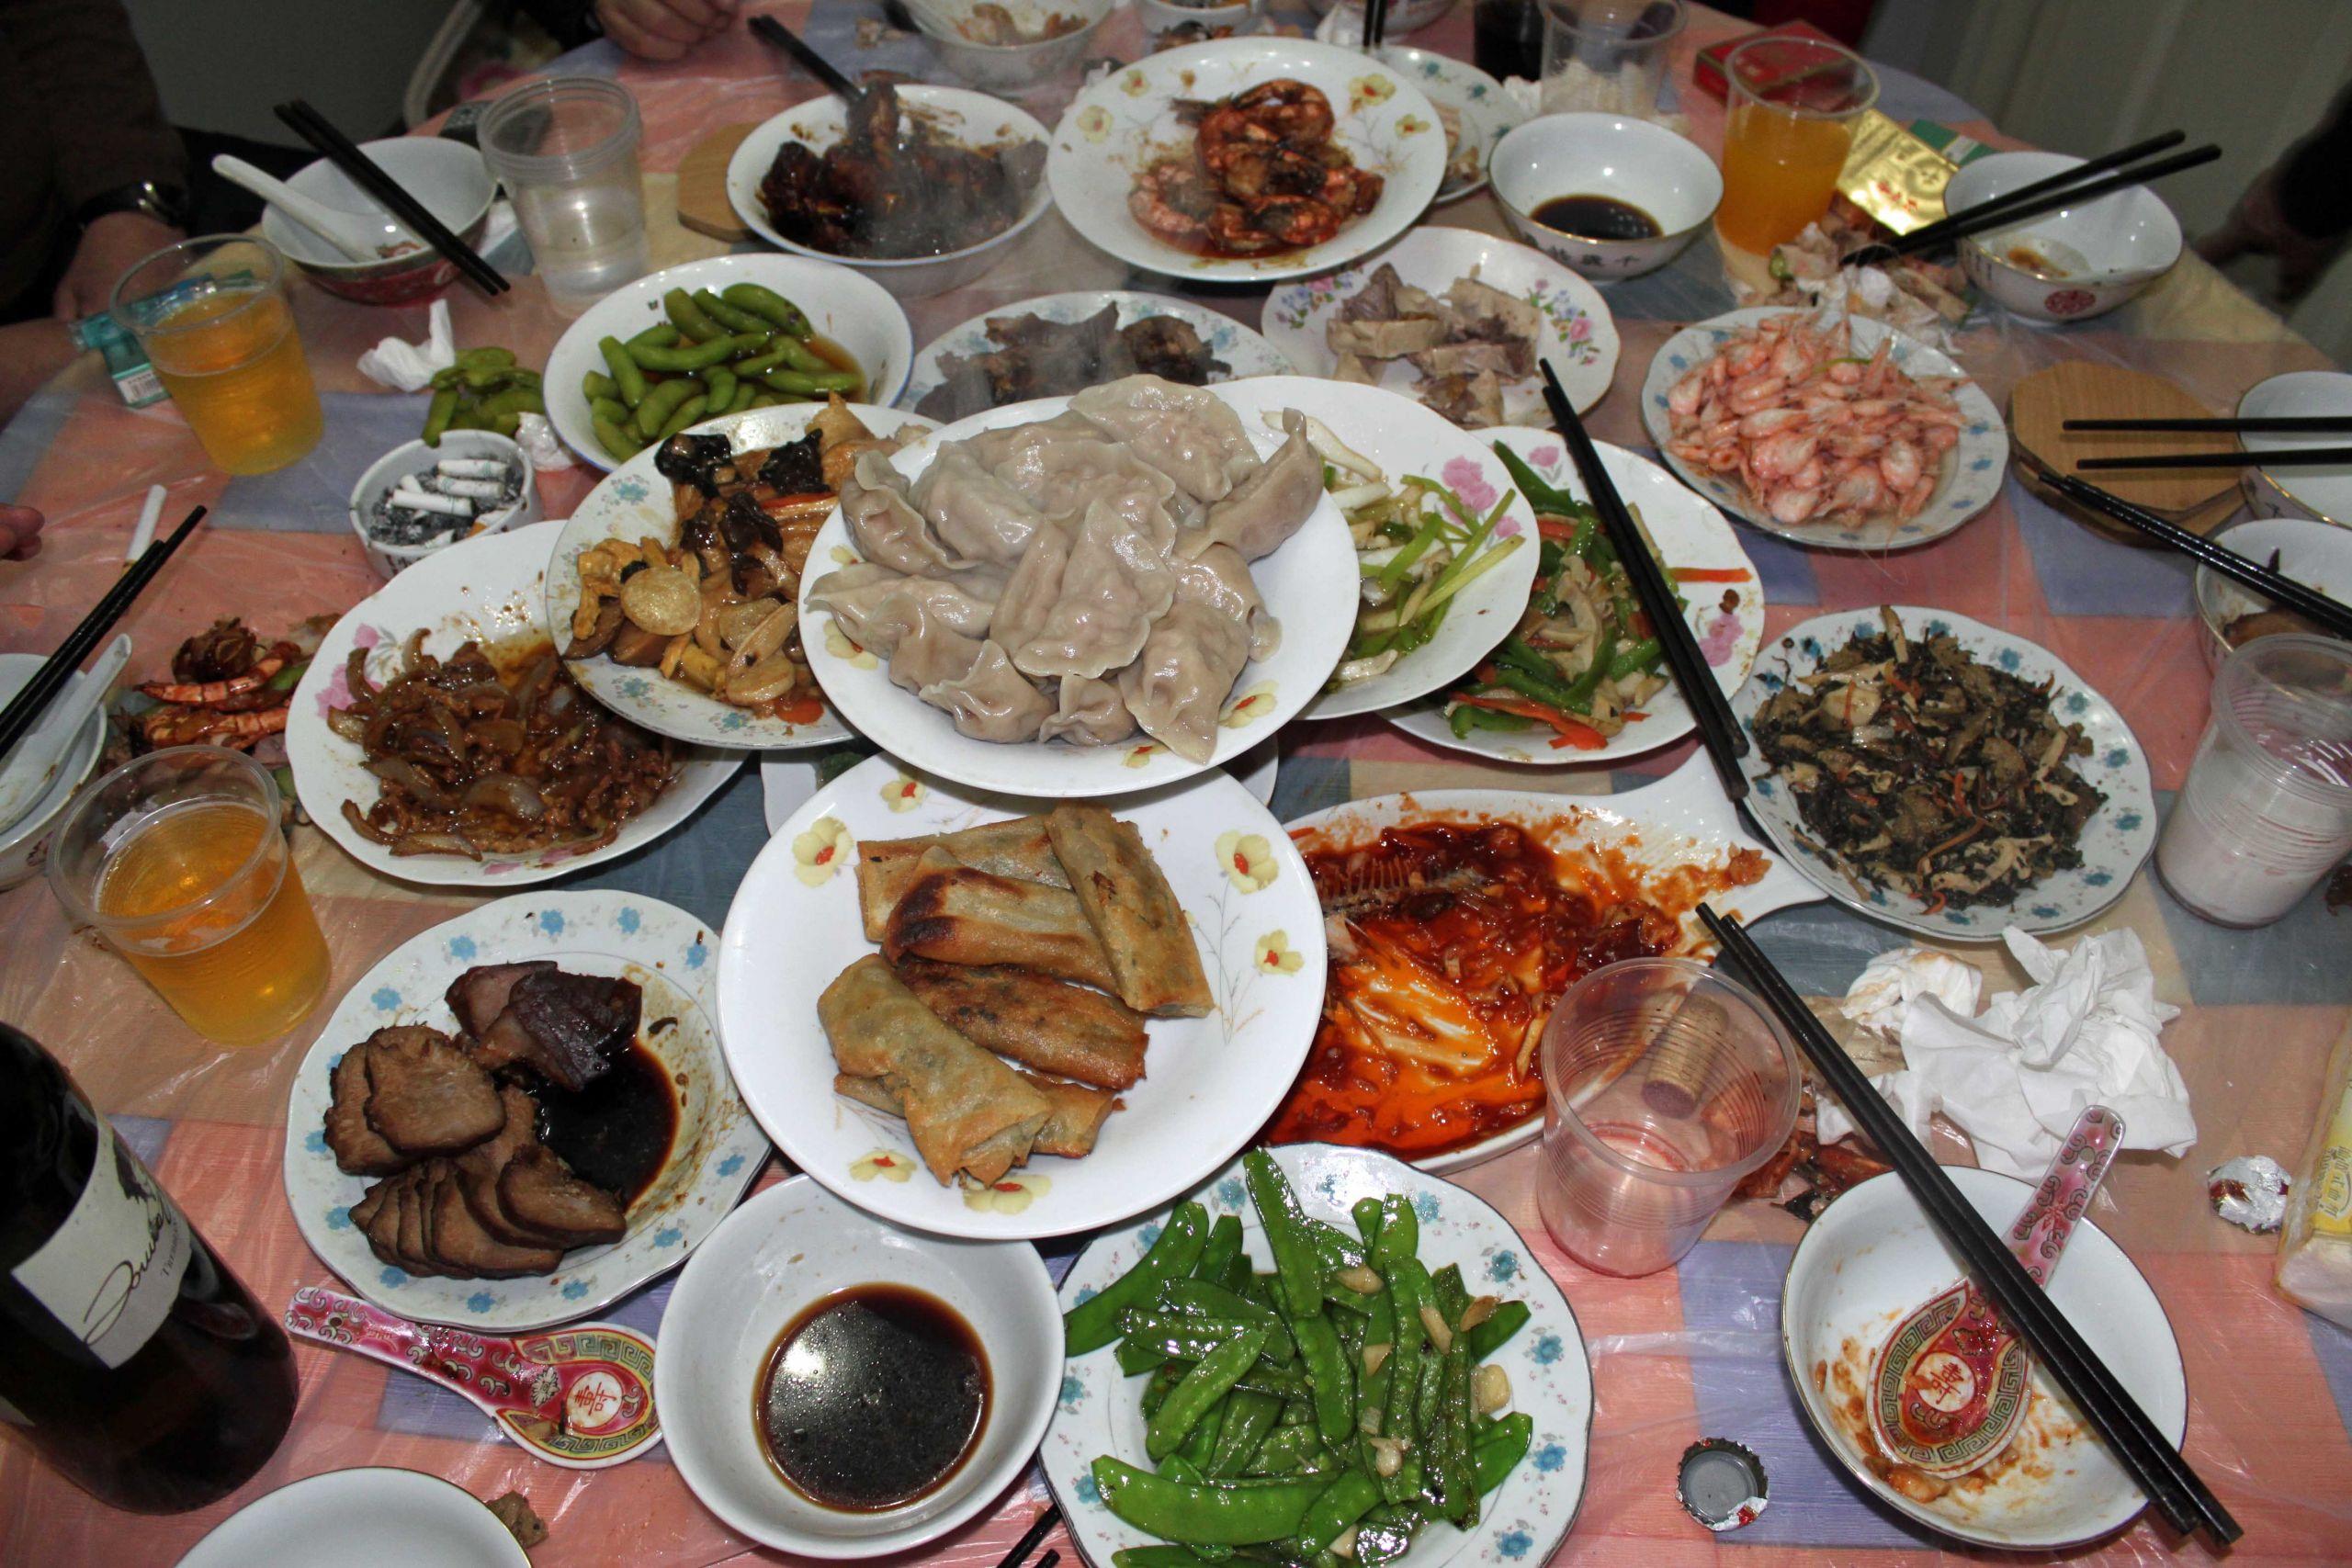 New Year Dinner  新年快乐 Xin Nian Kuai le Happy Chinese New Year